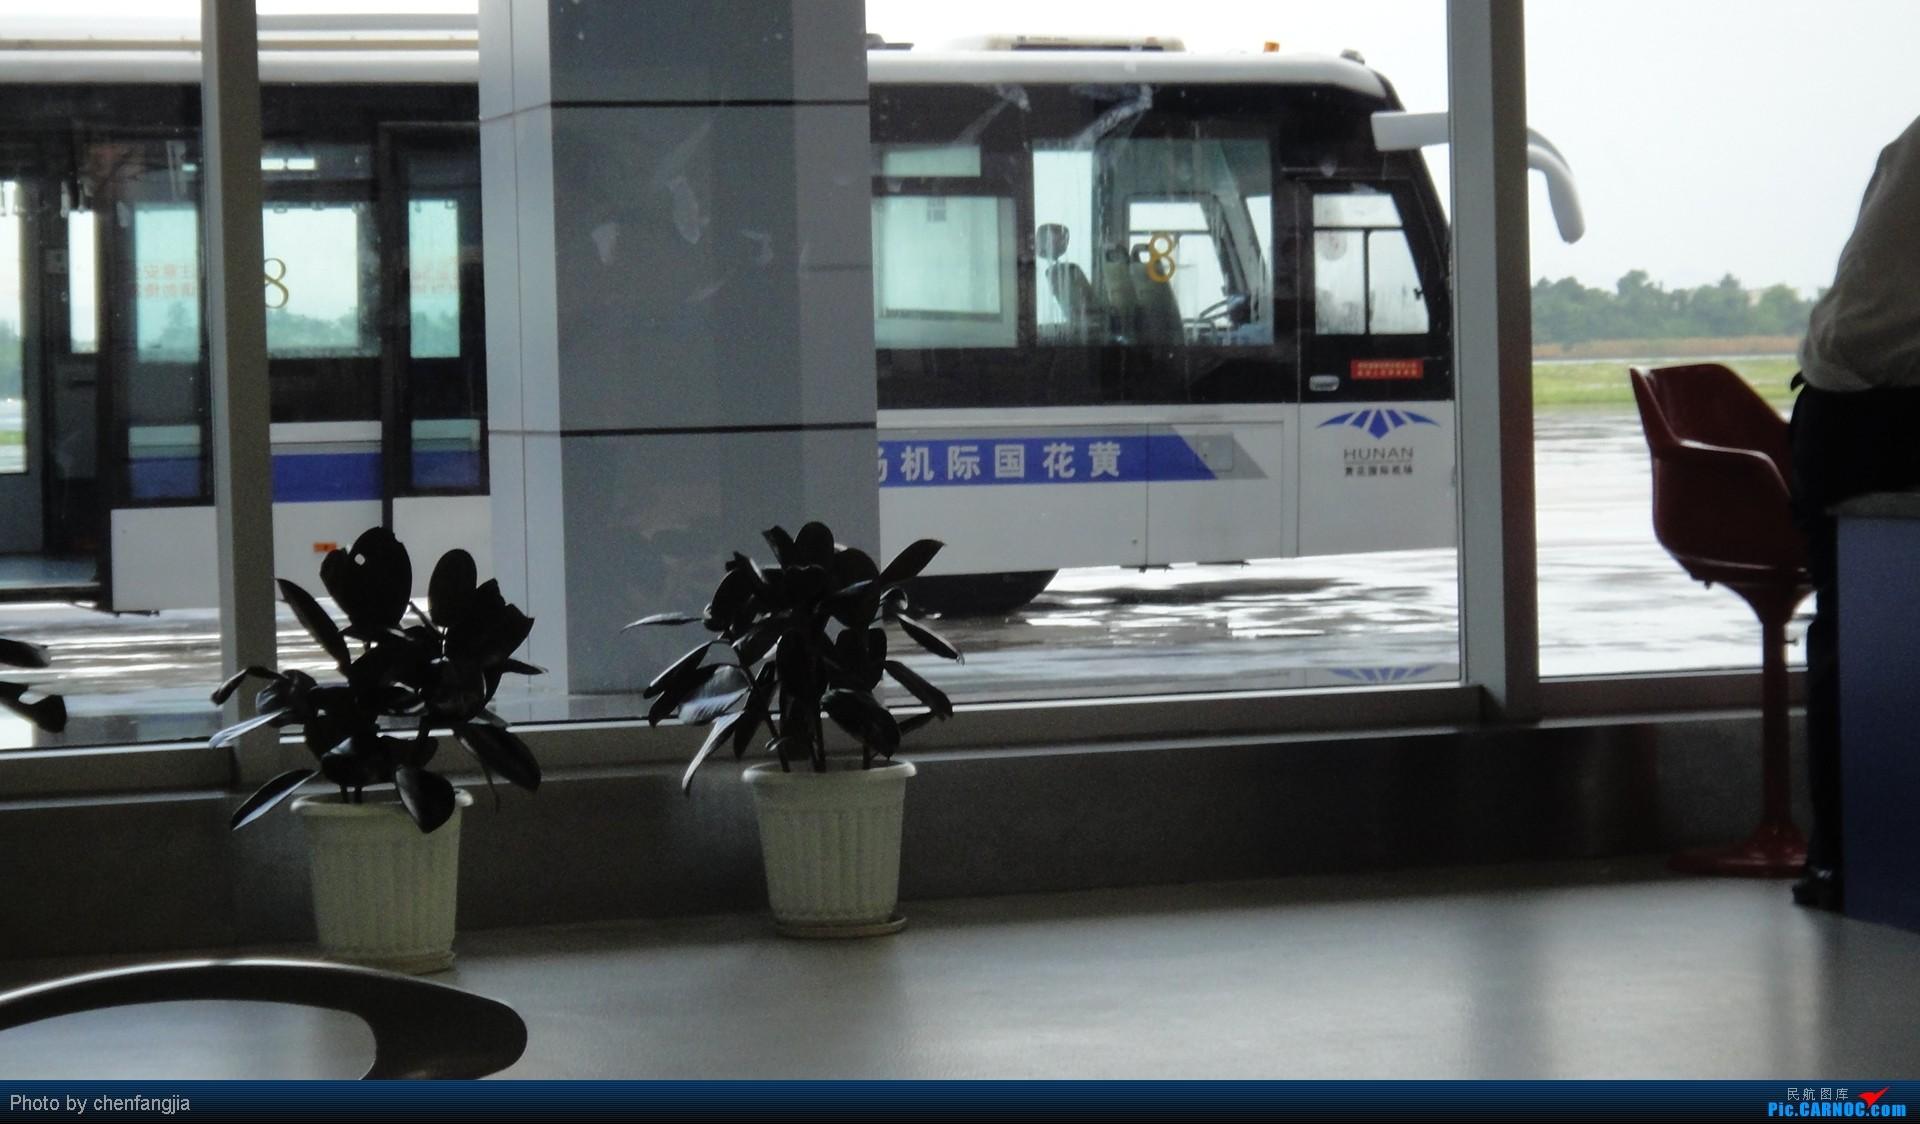 Re:[原创]新手发帖,多多支持!CSX-KMG  CZ3467  ---------标题要长--- AIRBUS A320-200 B-6303 中国长沙黄花机场 中国长沙黄花机场